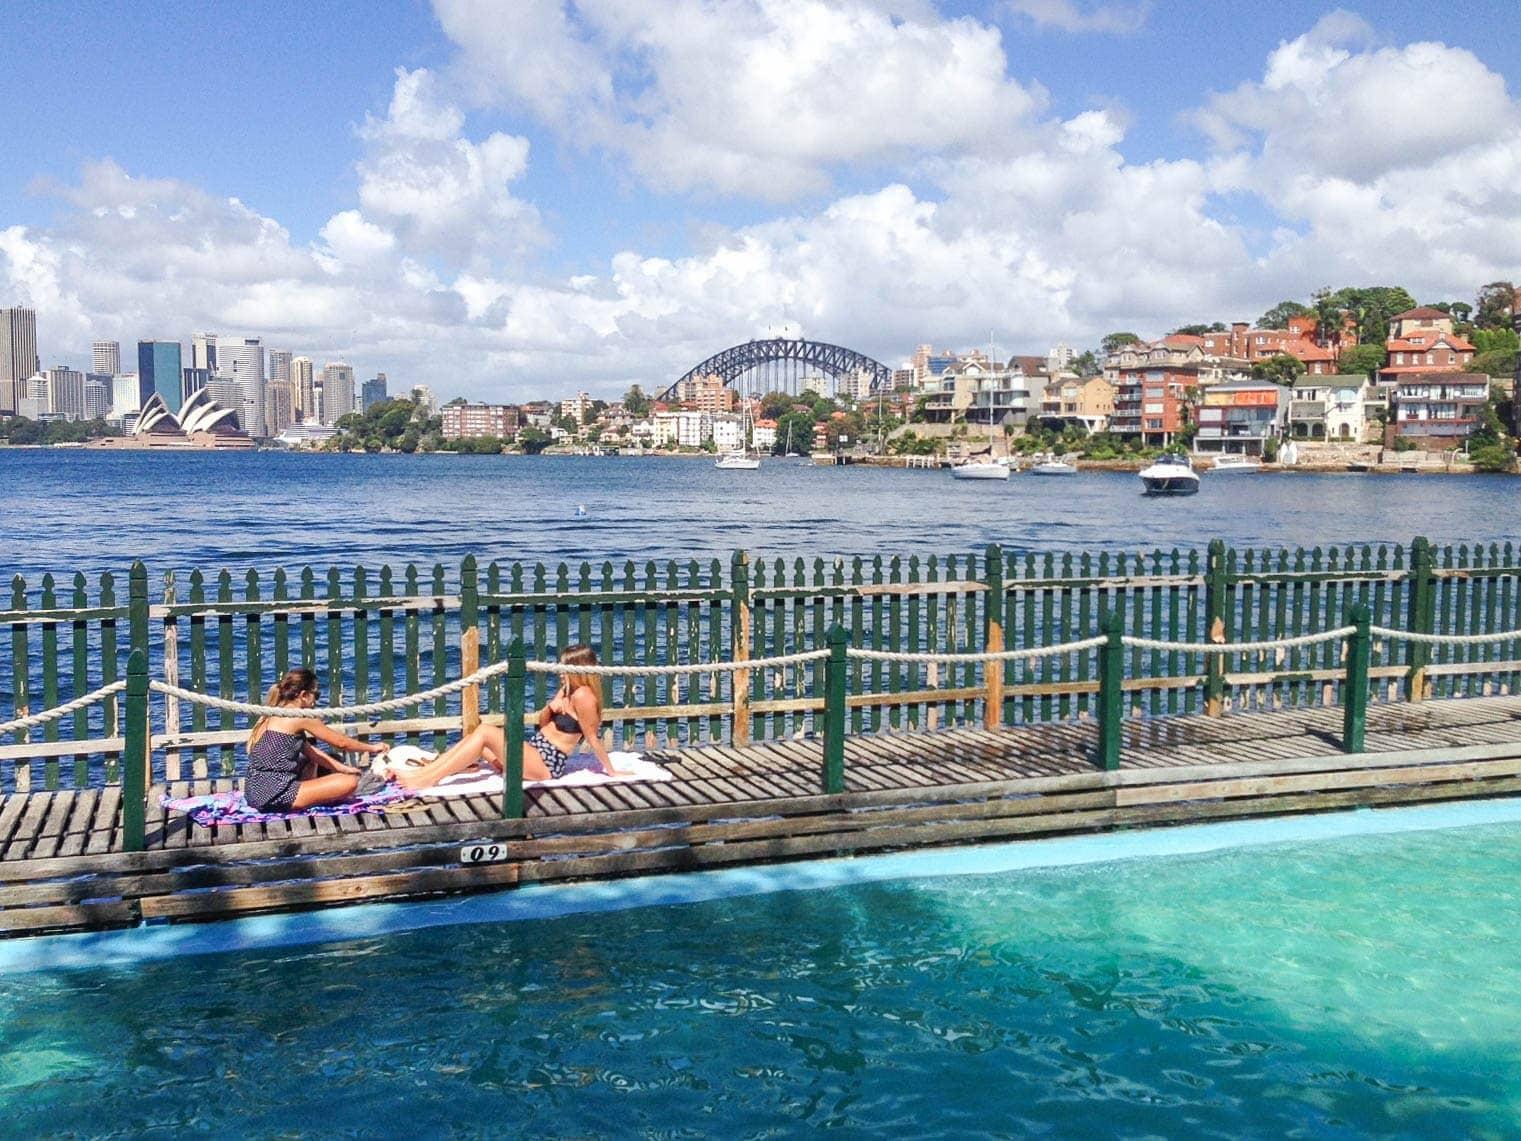 maccallum-pool-sydney-best-swimming-spots